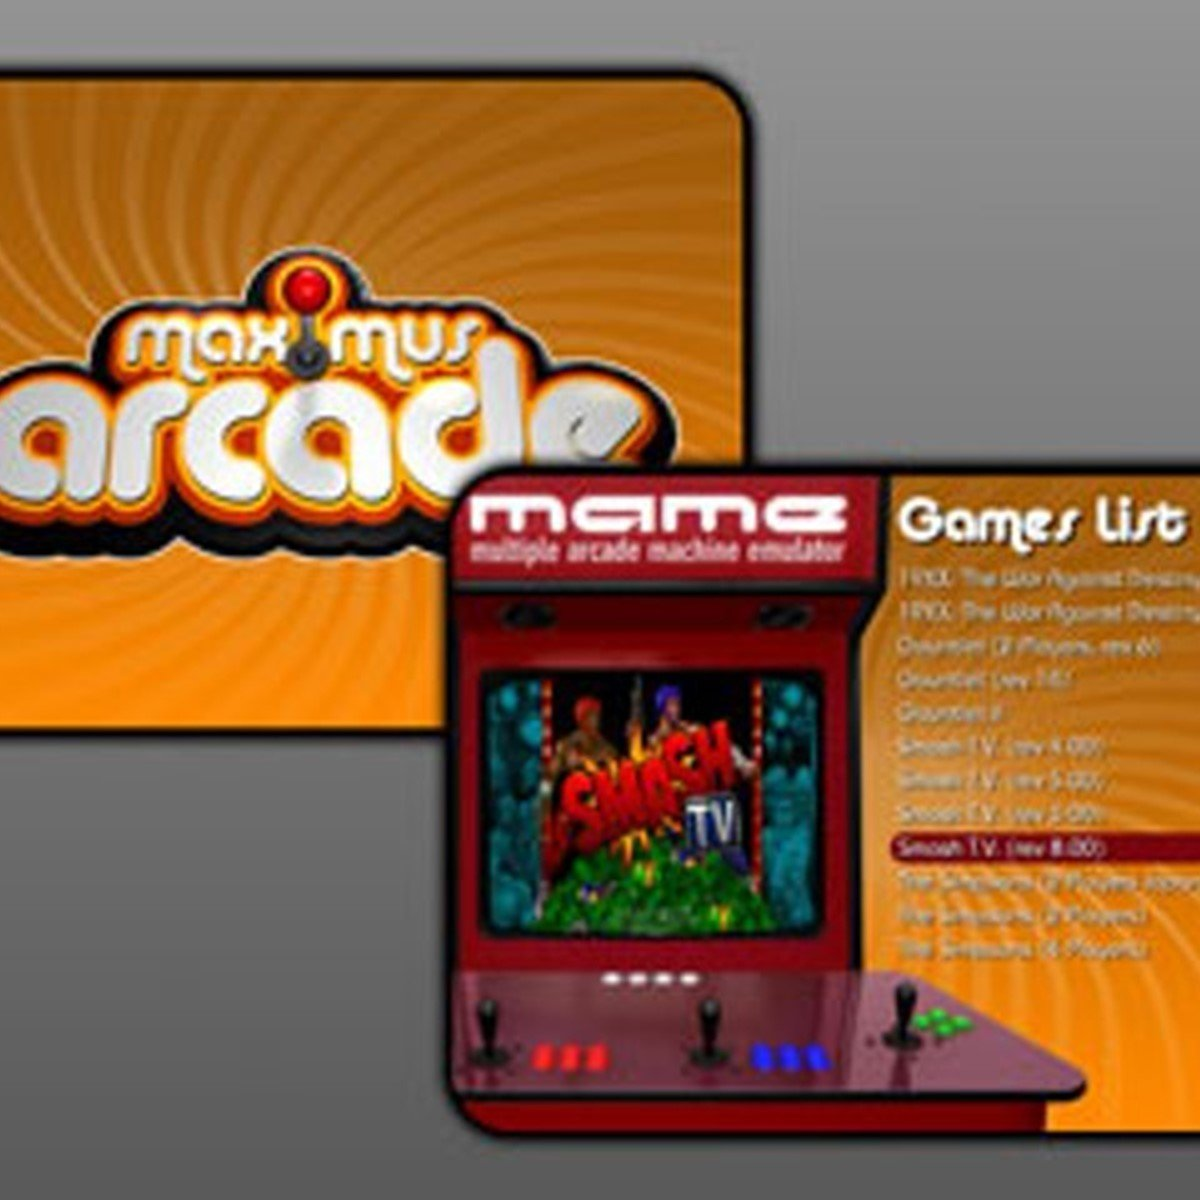 Maximus Arcade Alternatives and Similar Games